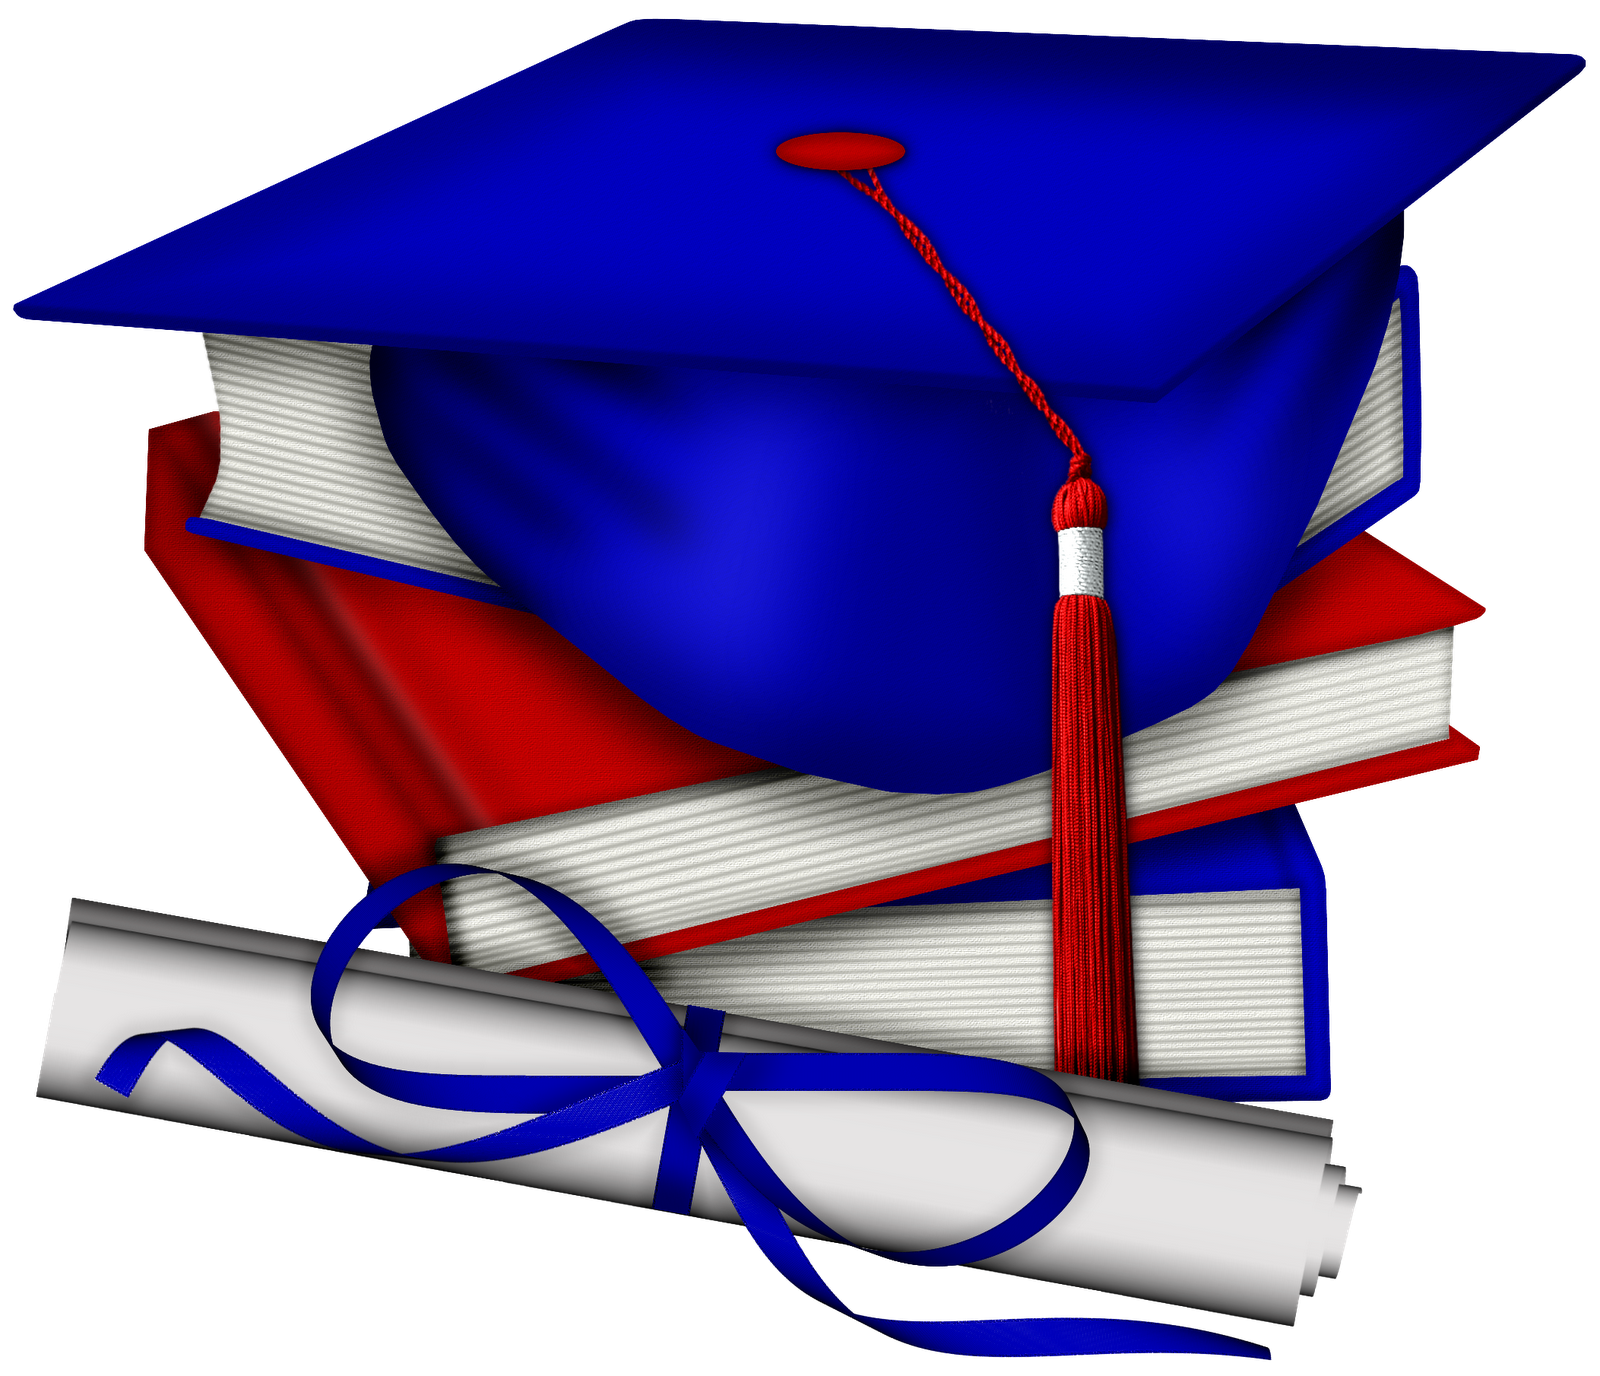 graduation border clipart clipart panda free clipart images rh clipartpanda com graduation hat border clip art graduation cap border clip art free